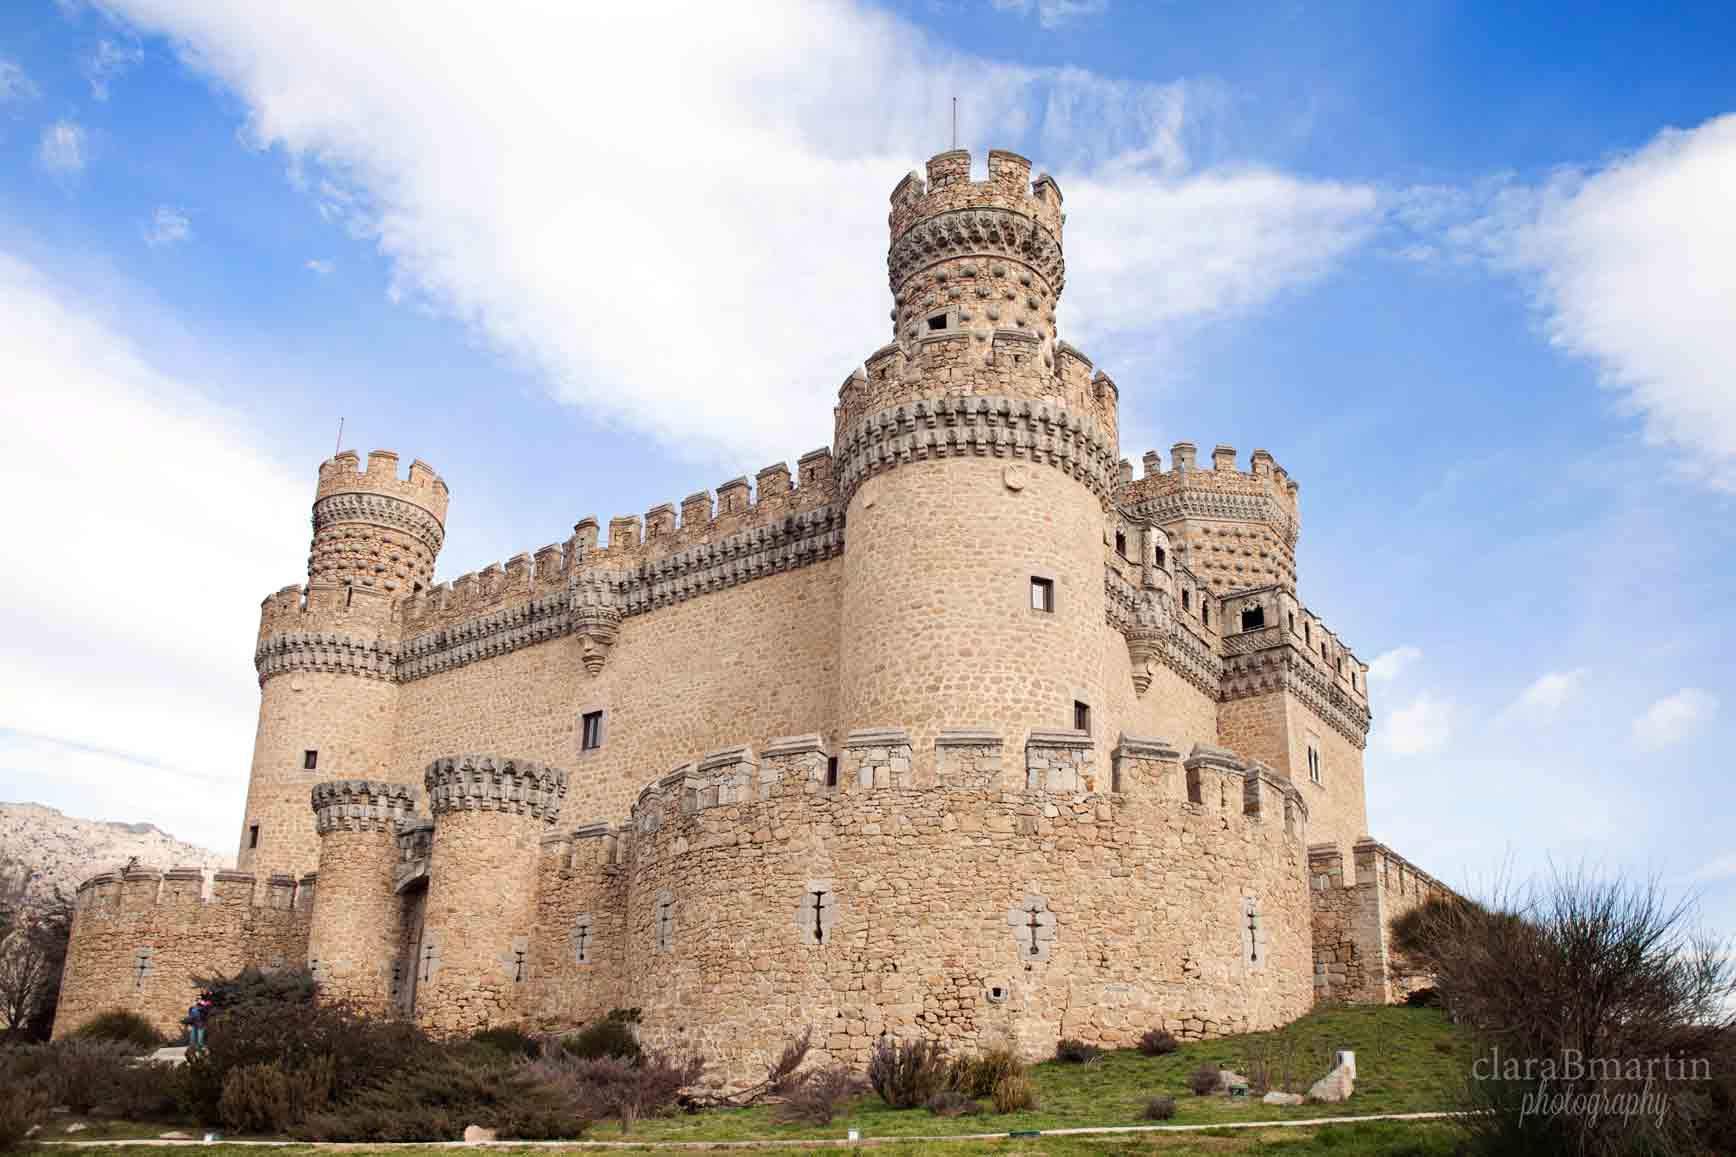 Castillo-Manzanares-El-Real-claraBmartin-02